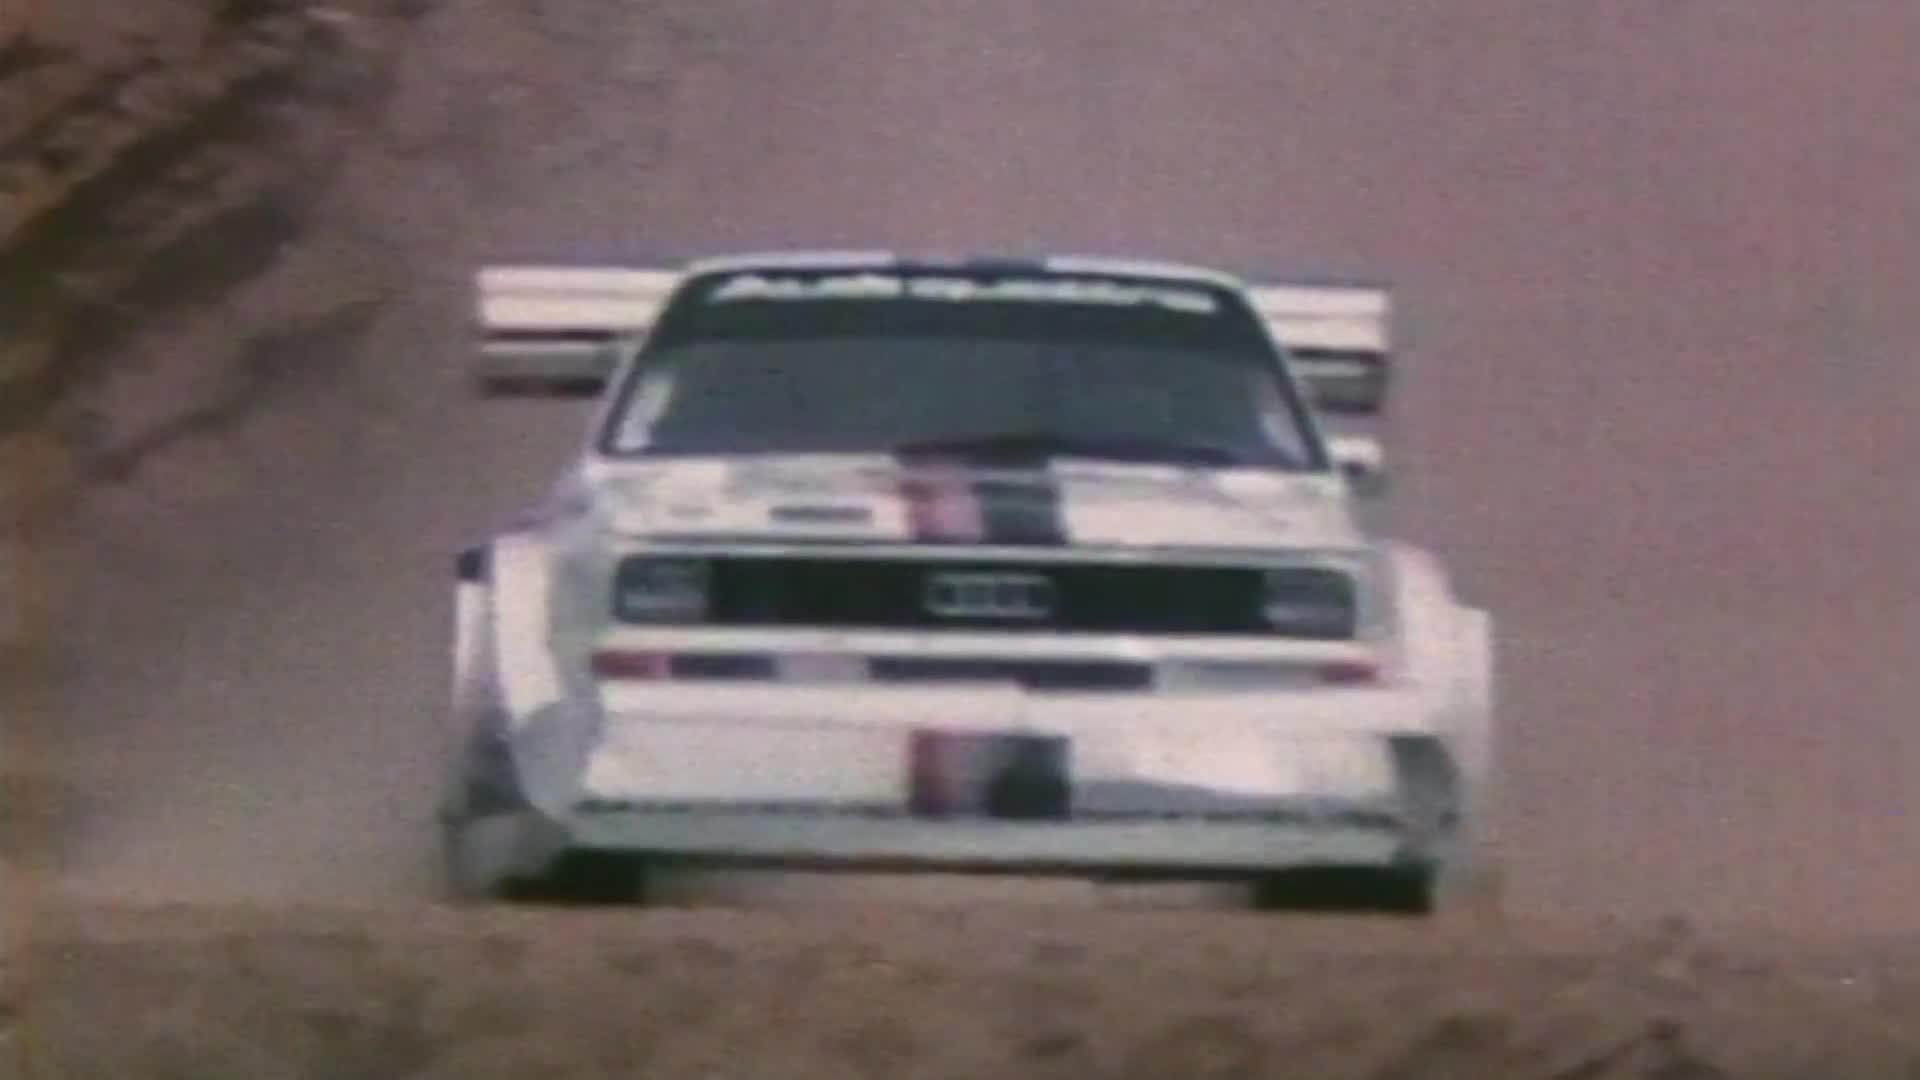 audi, audi of america, audi usa, Audi Sport: A Legacy Story in Five Cylinders Trailer GIFs